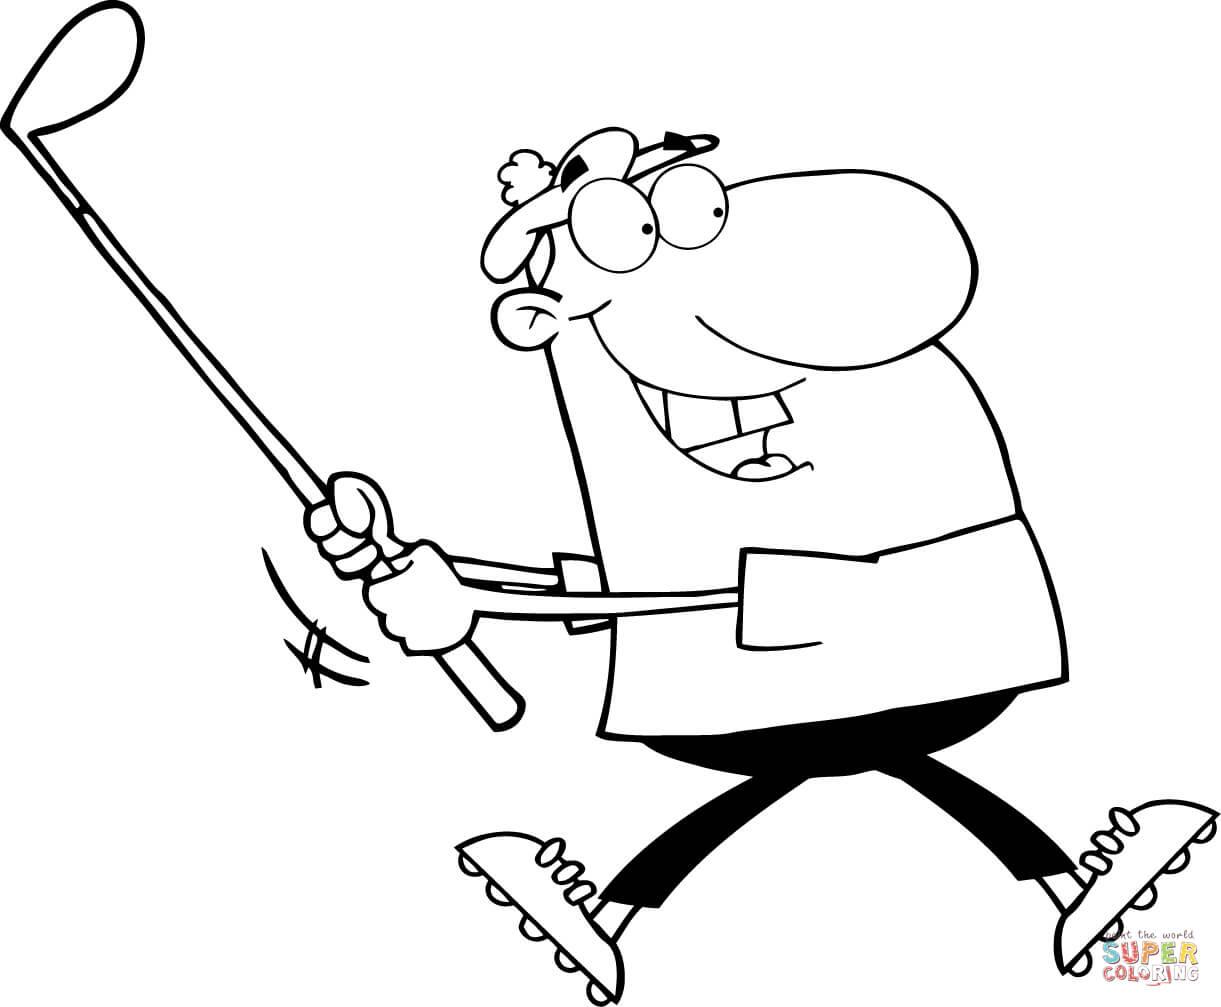 Golf coloring #7, Download drawings